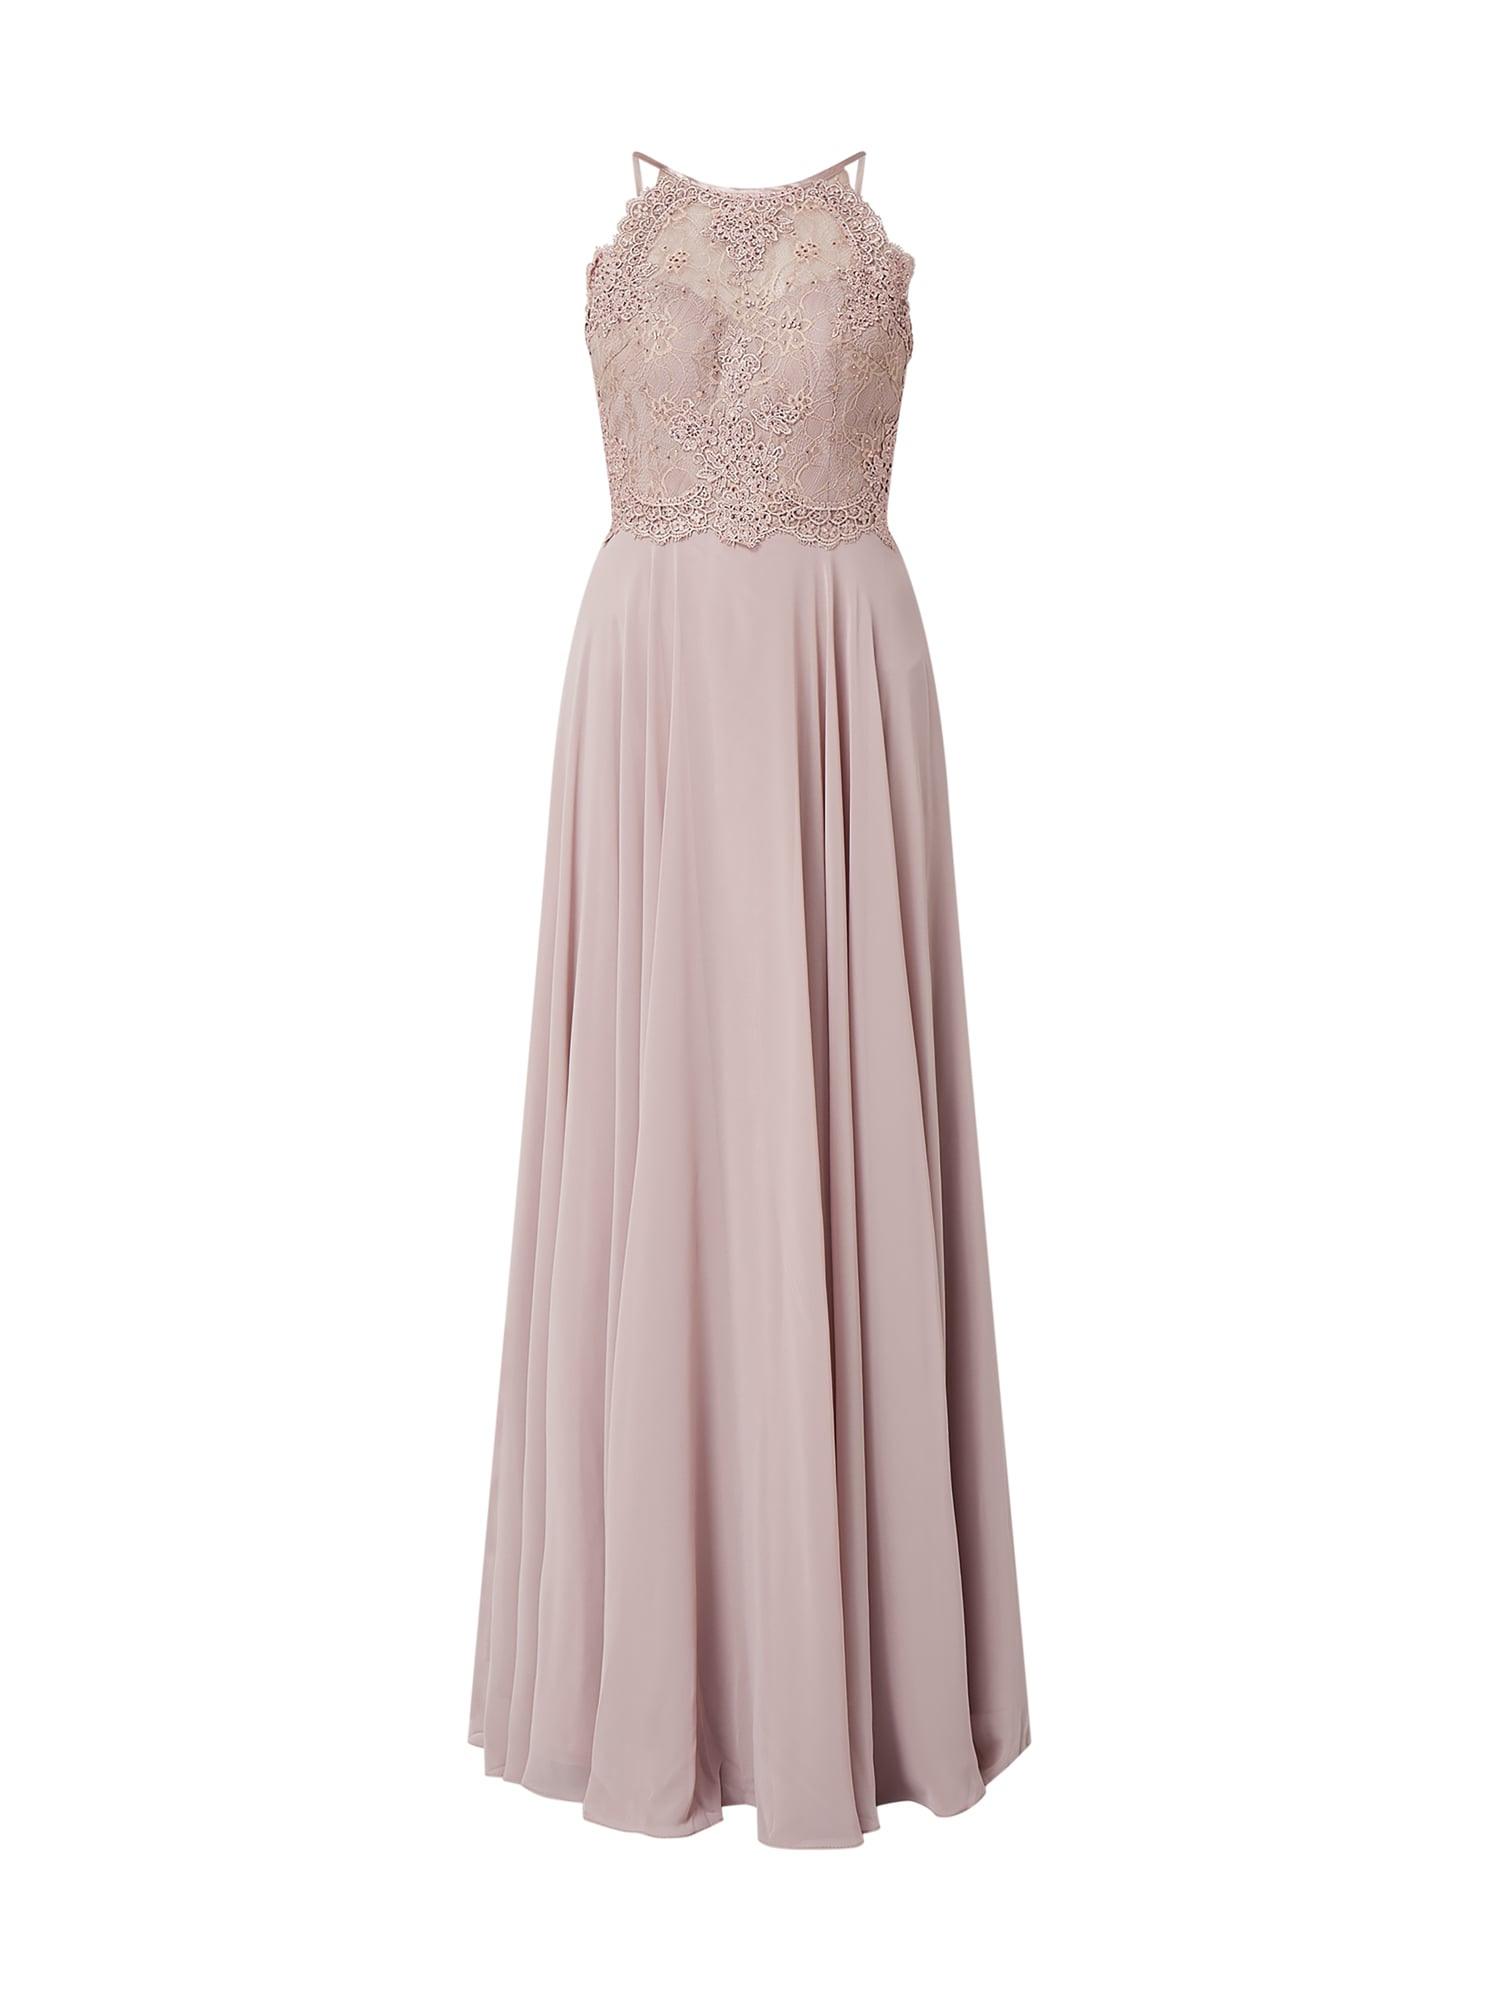 Designer Elegant Luxuar Limited Abendkleid SpezialgebietDesigner Cool Luxuar Limited Abendkleid Vertrieb